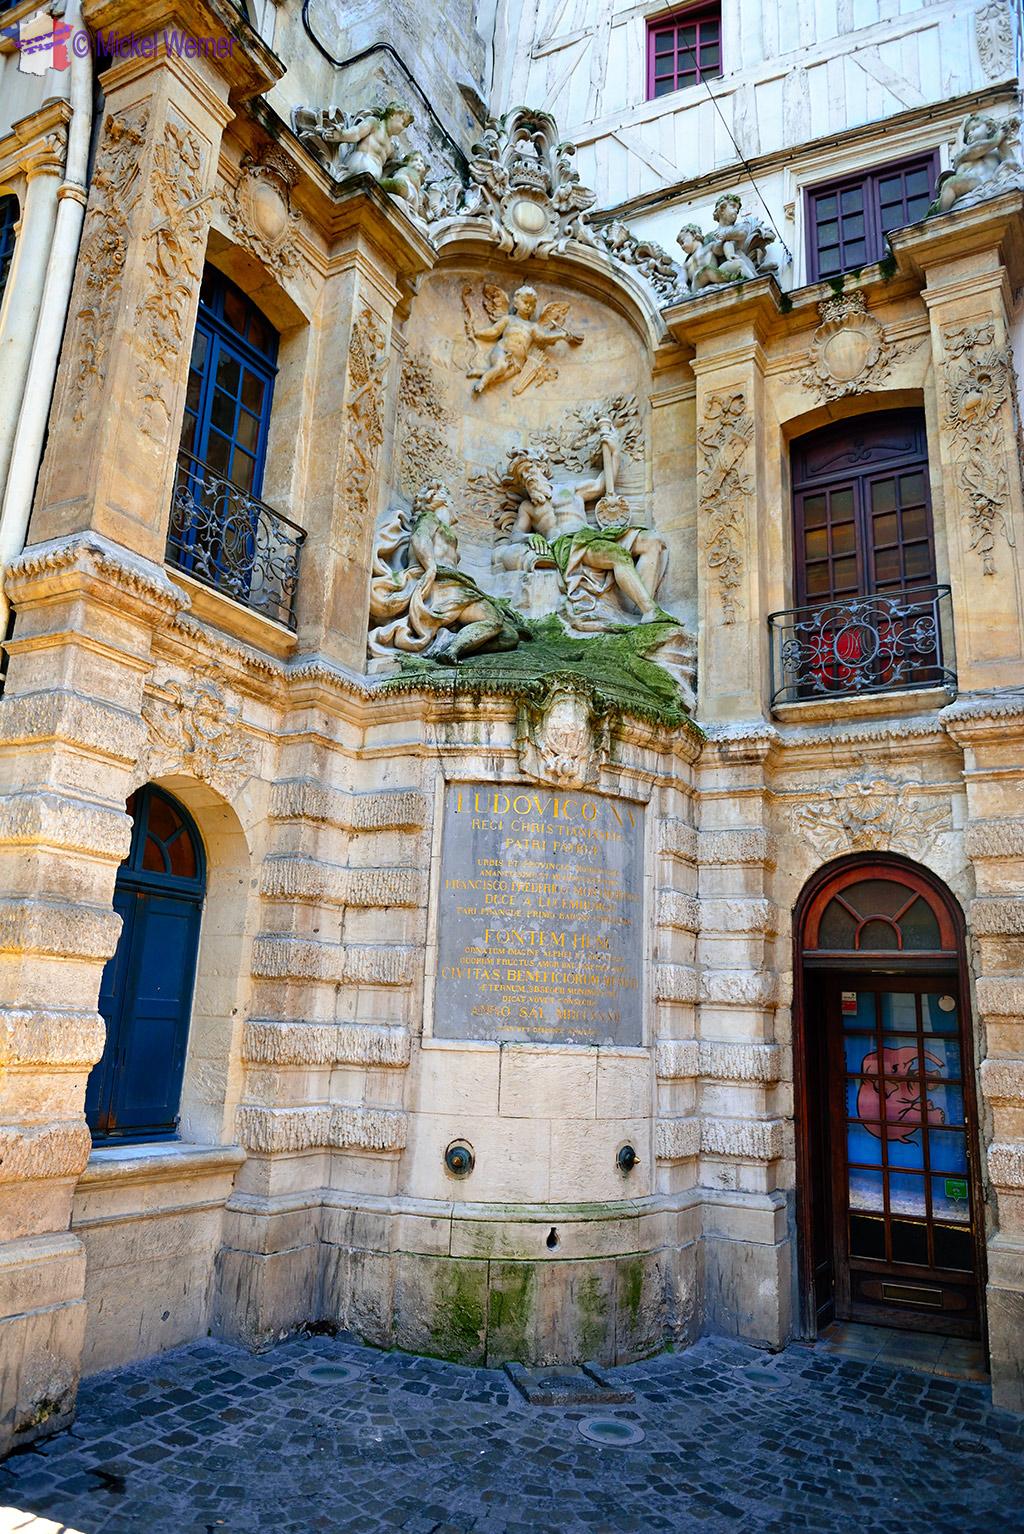 Museum of the Big Clock of Rouen